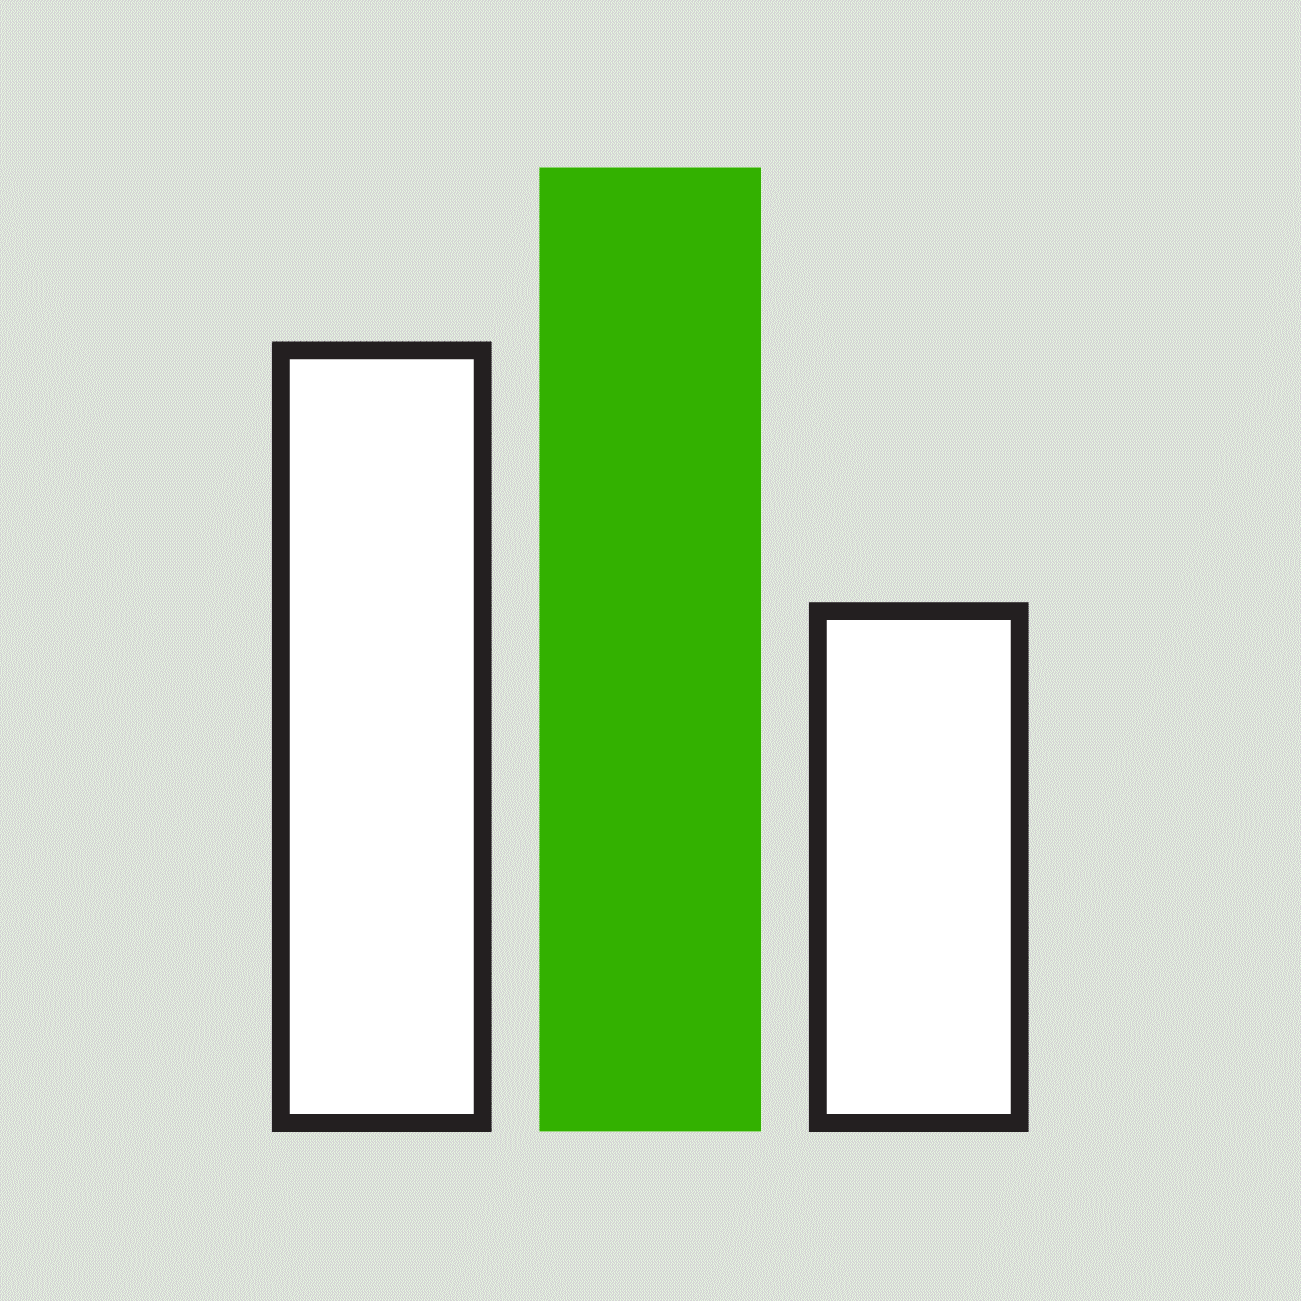 rankings icon